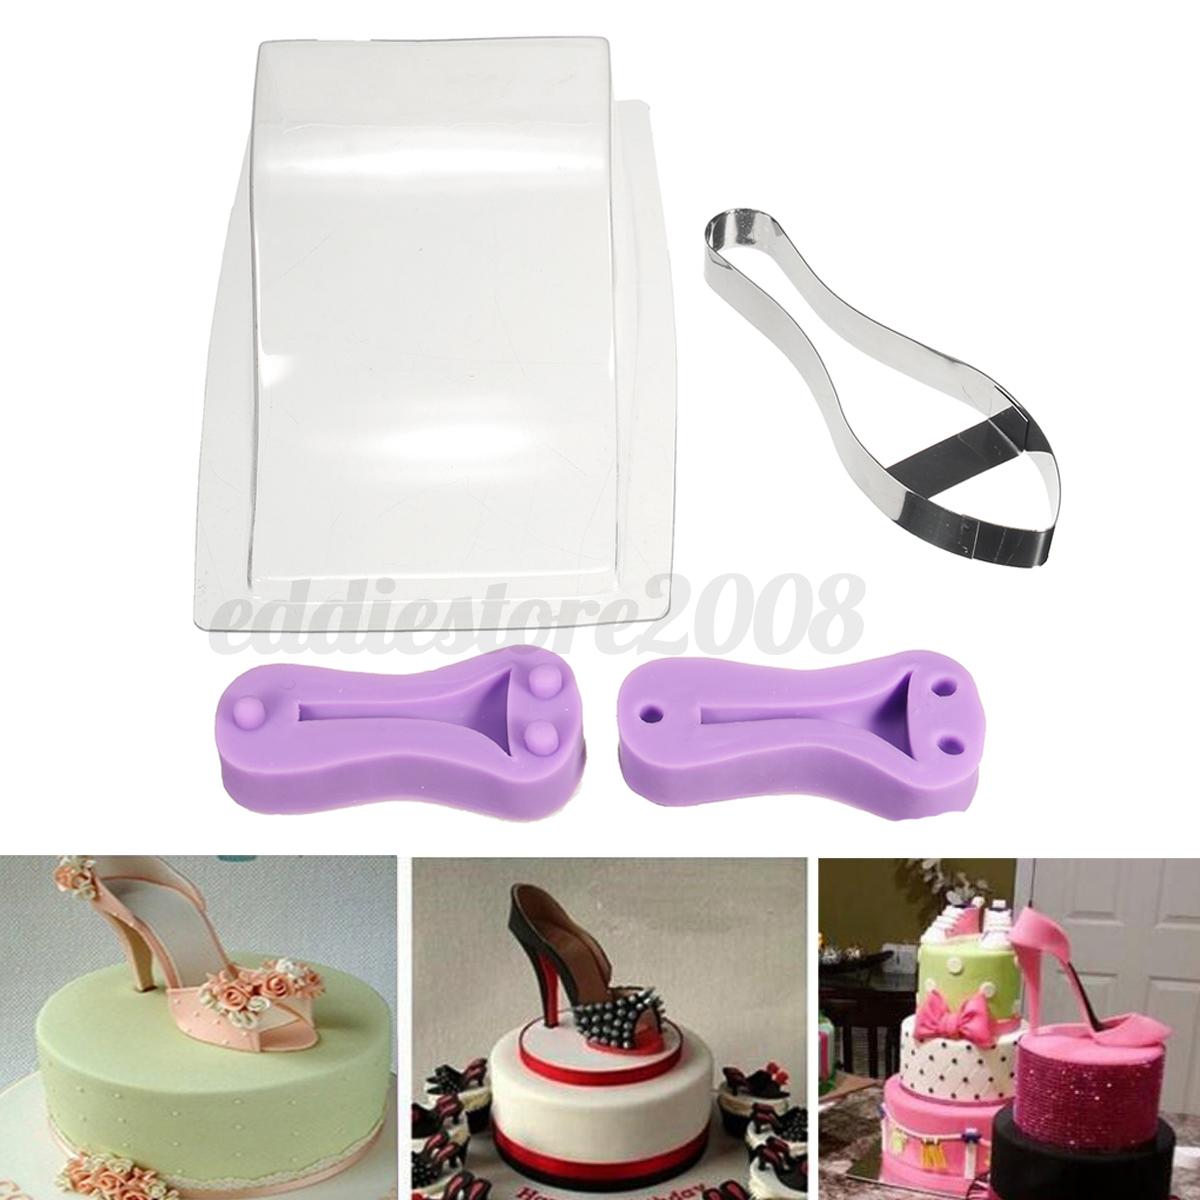 high heel shoe kit silicone fondant cake mould template